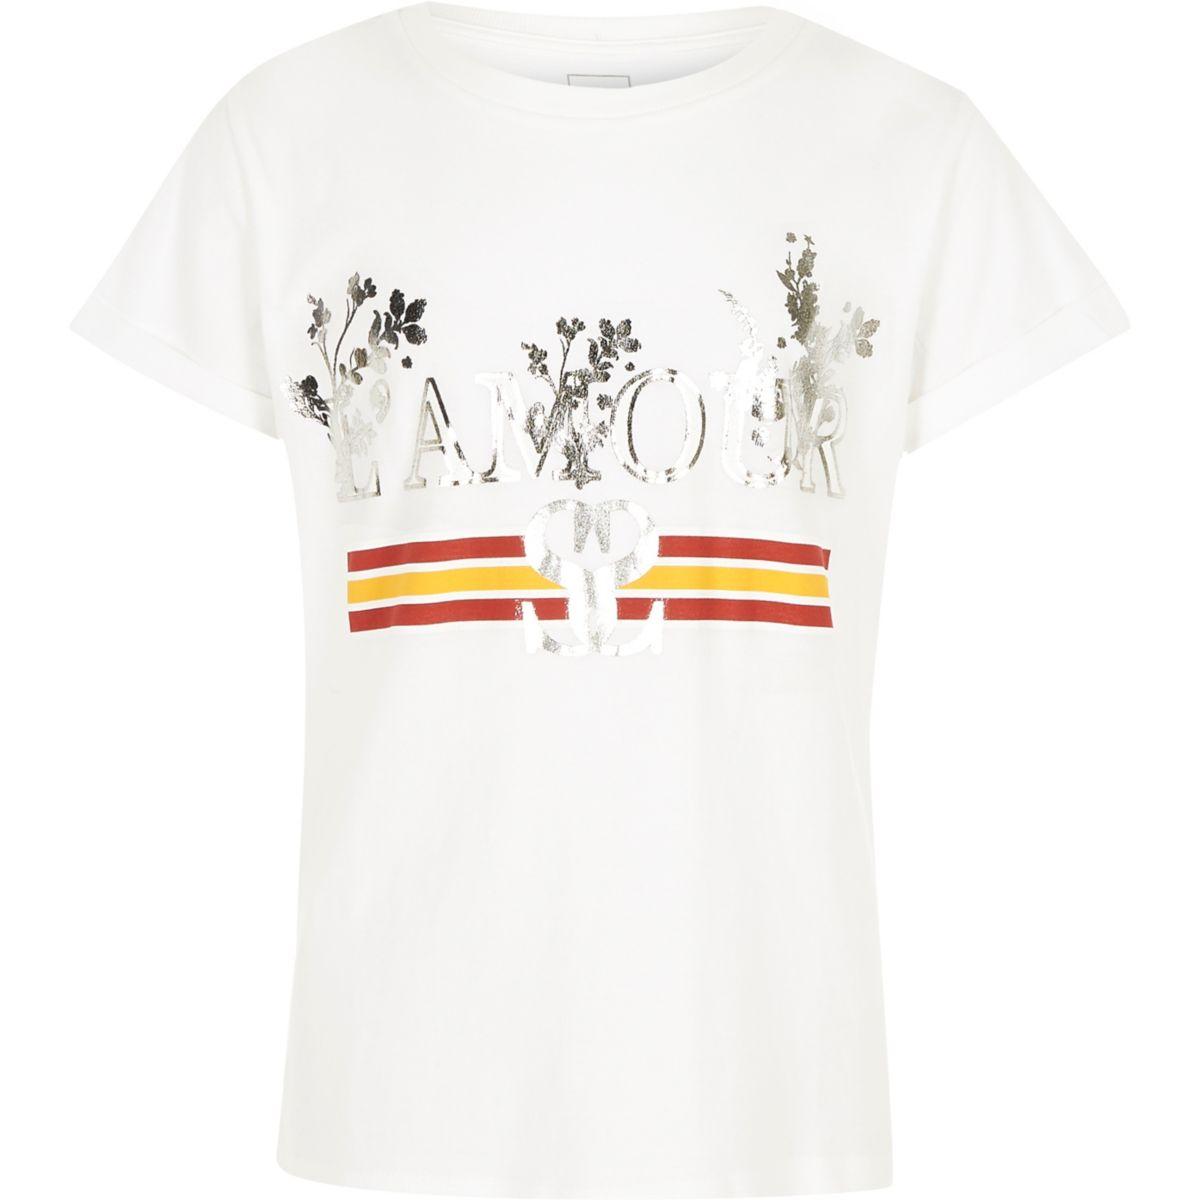 Girls white l amour foil print t shirt tops sale girls for Foil print t shirts custom